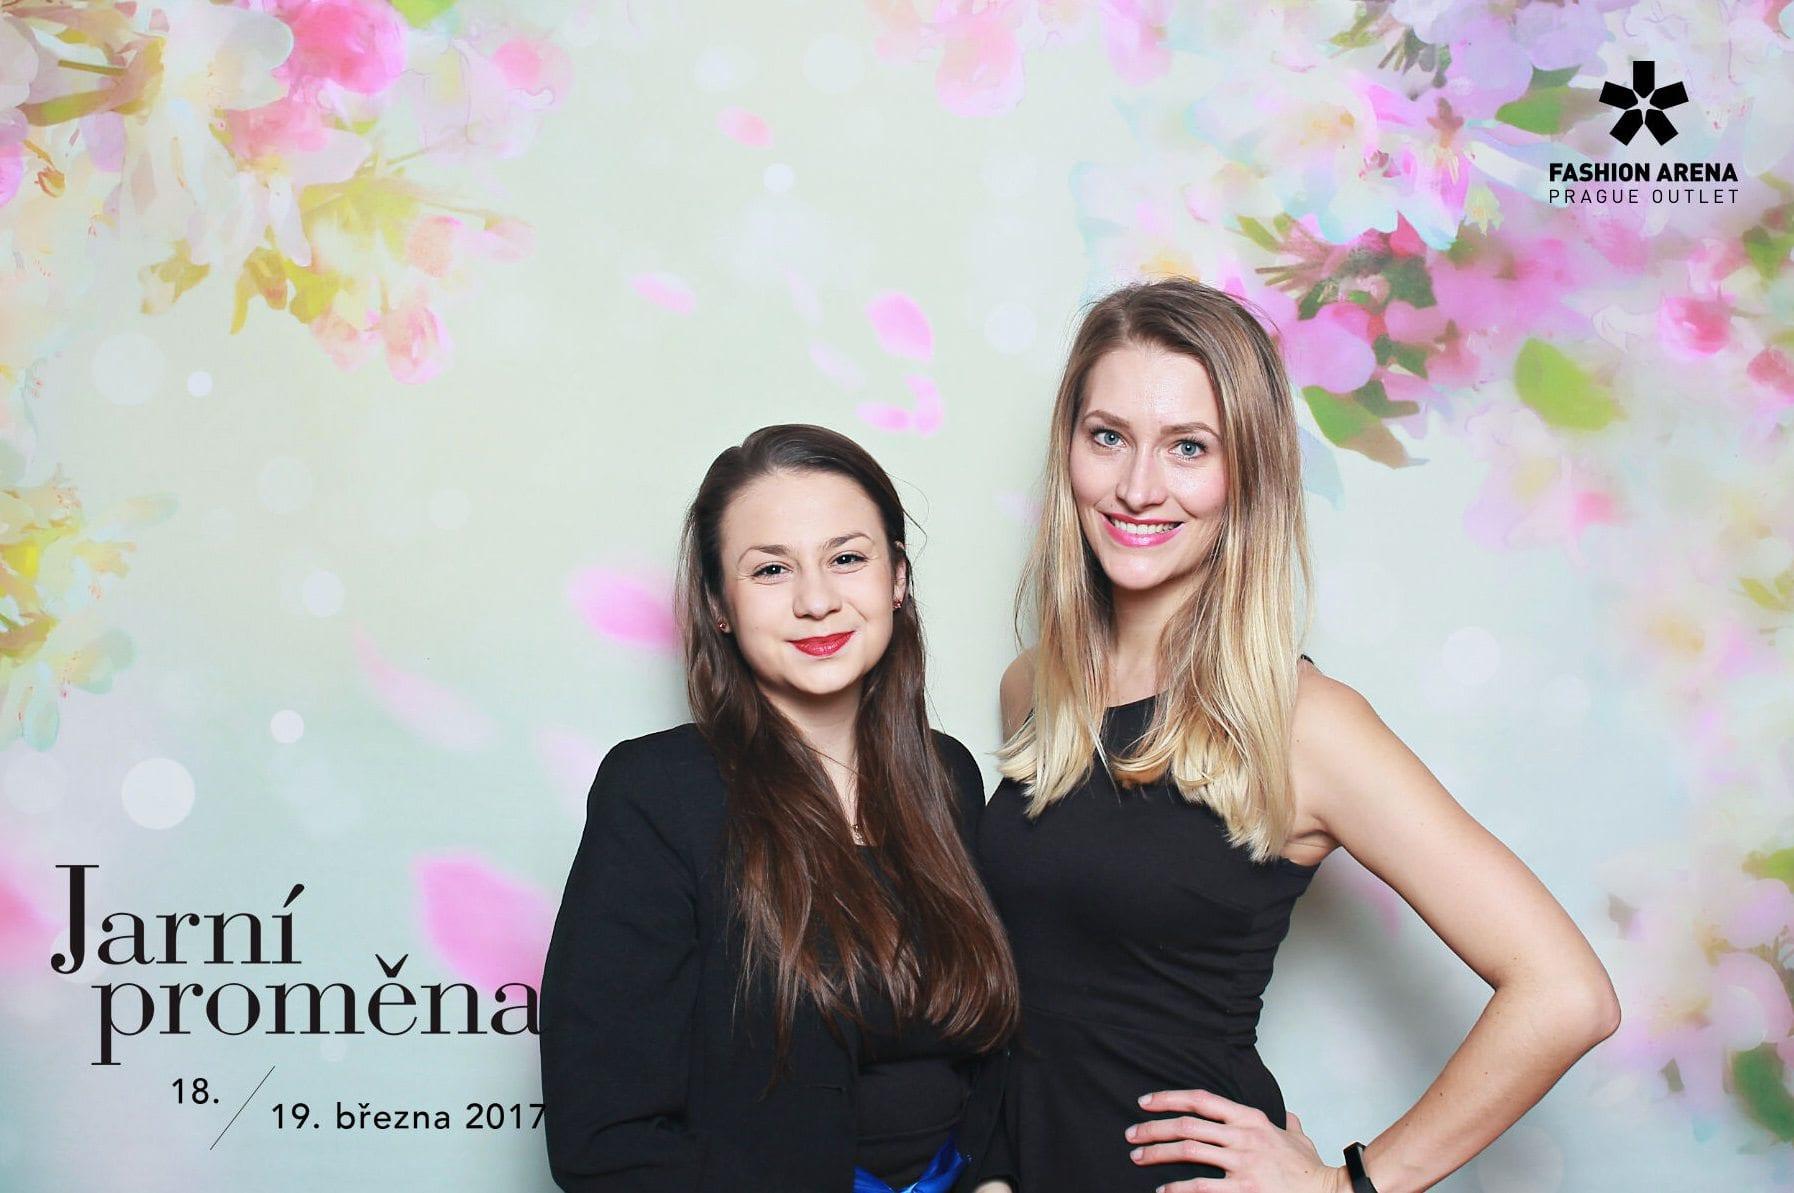 fotokoutek-fashion-arena-jarni-promena-18-3-2017-229686